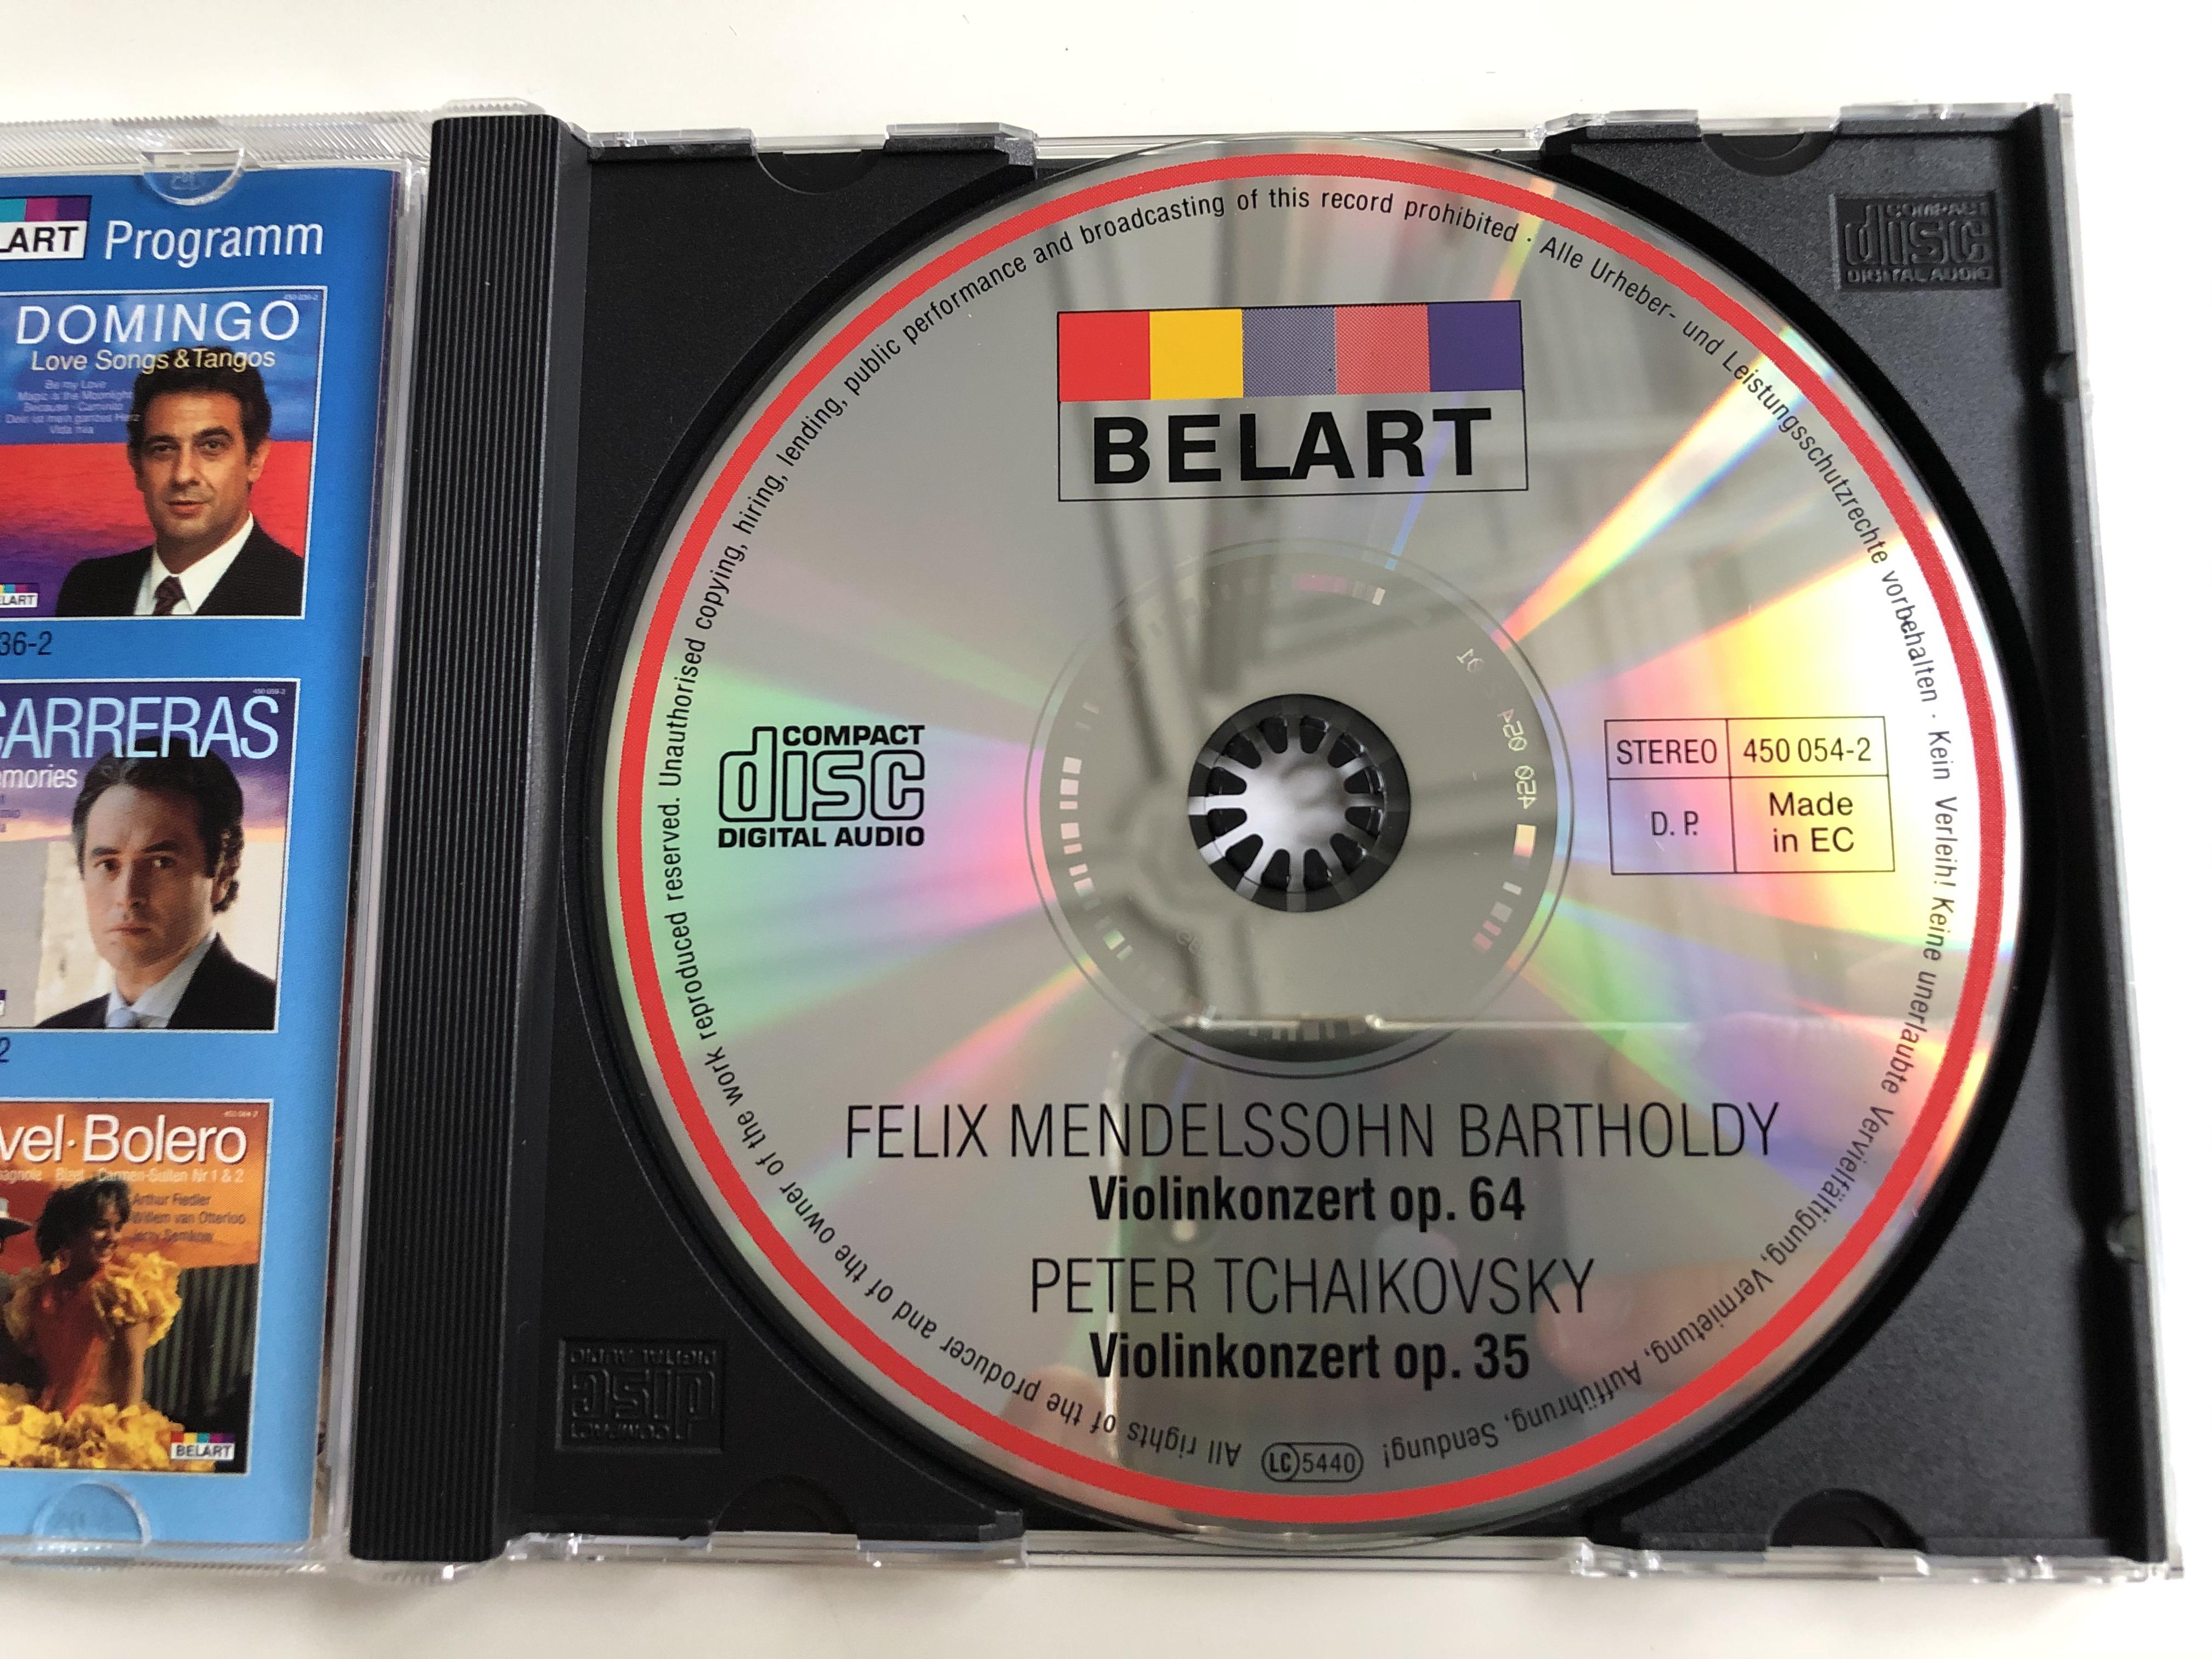 mendelssohn-tchaikovsky-violinkonzerte-violin-concertos-arthur-grumiaux-mayumi-fujikawa-royal-concertgebouw-orchestra-amsterdam-bernard-haitink-belart-audio-cd-stereo-450-054-2-3-.jpg